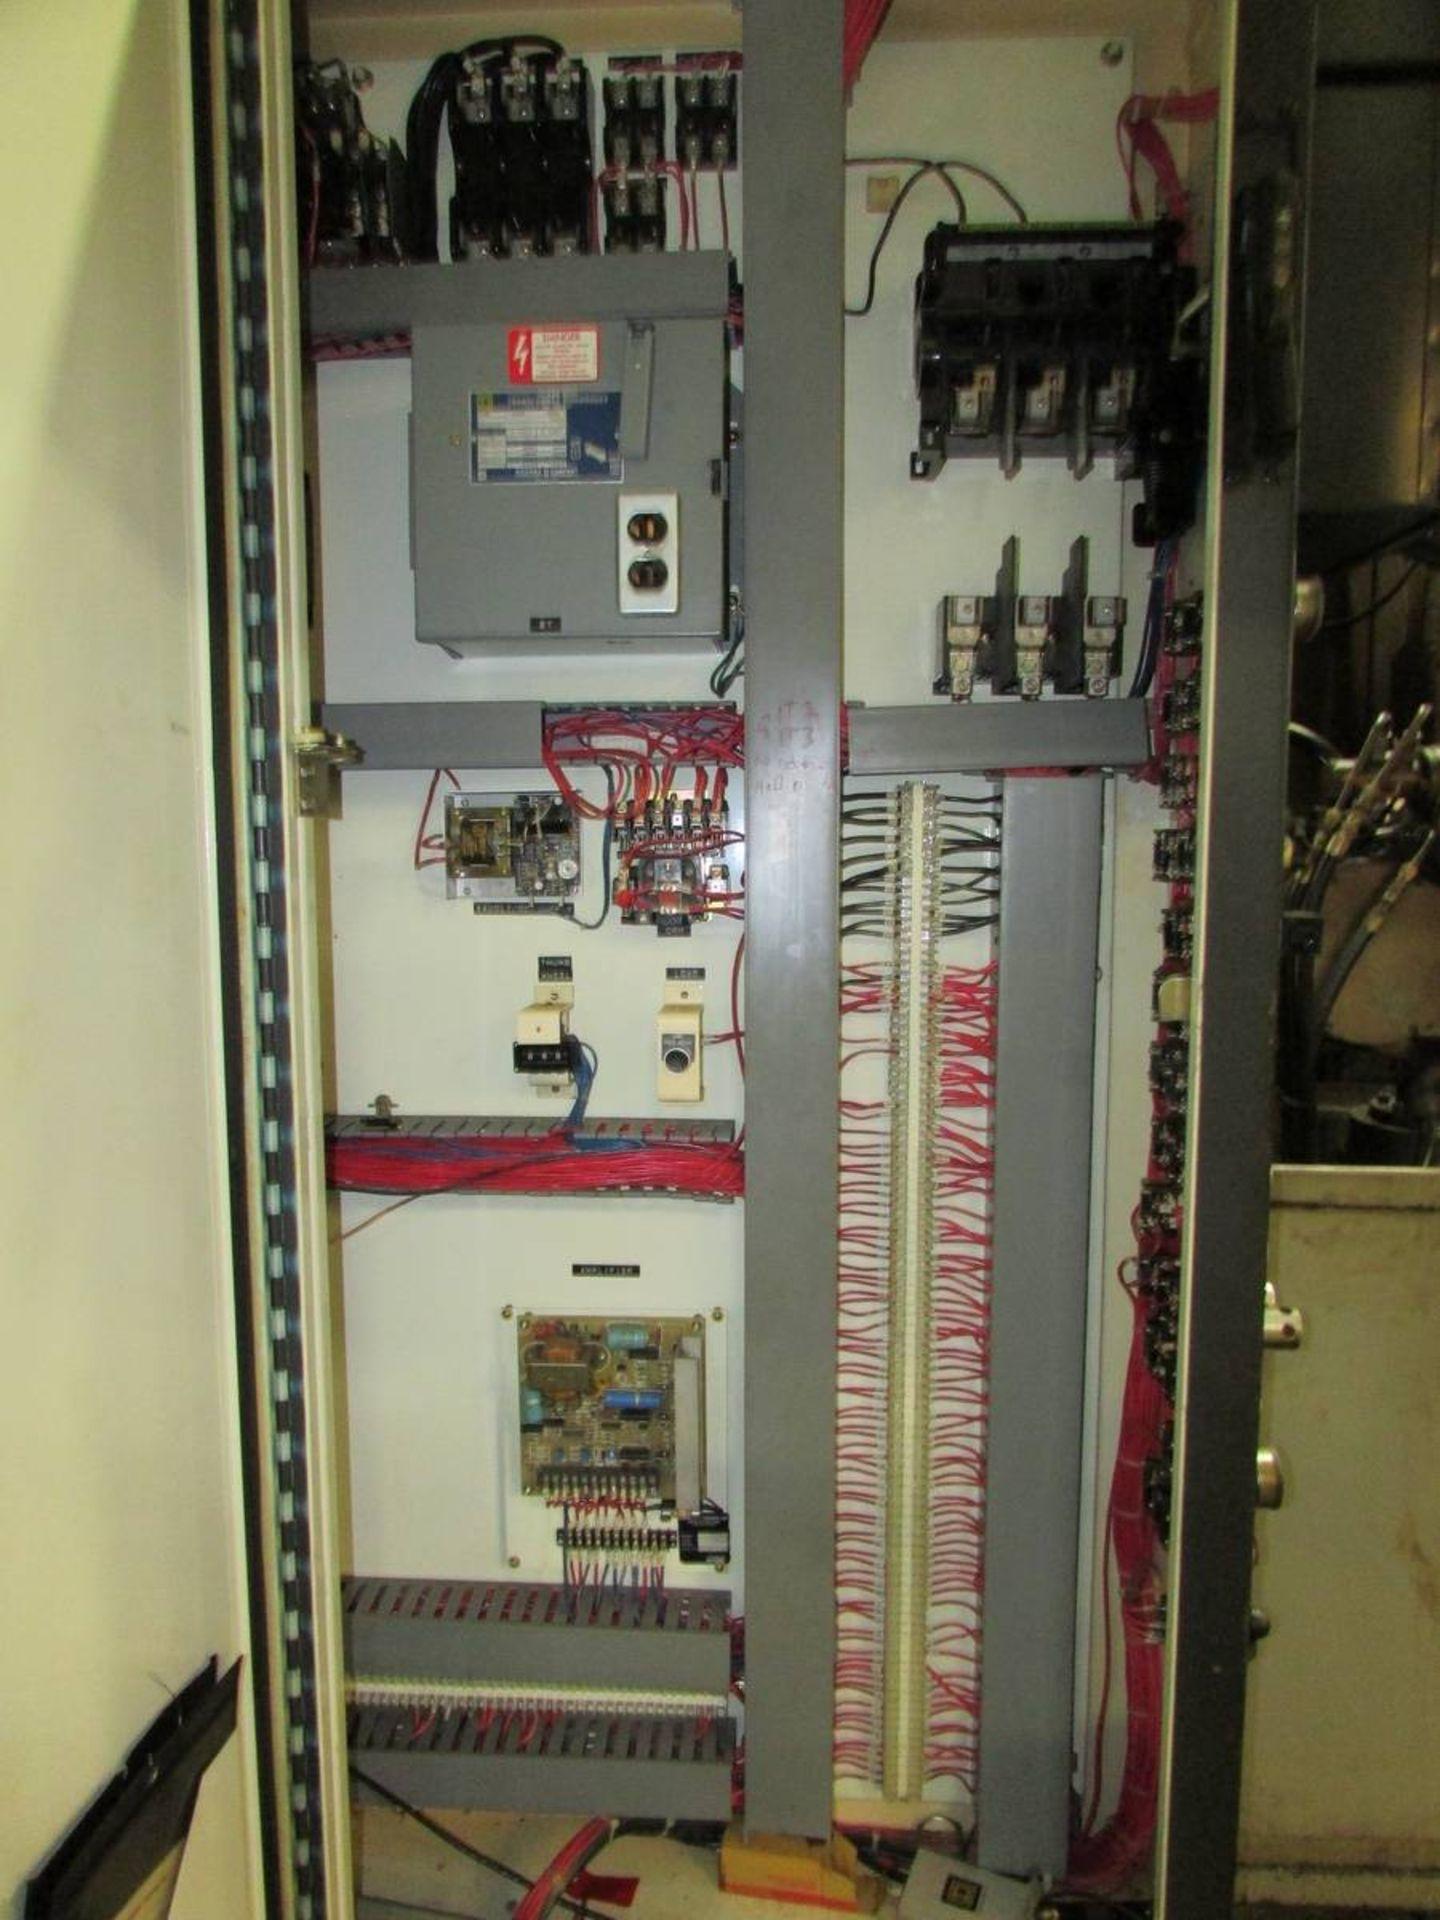 Cleveland/ Waterbury Farrel CR300-612-002 Universal CNC Gear Hobbing Machine - Image 17 of 19